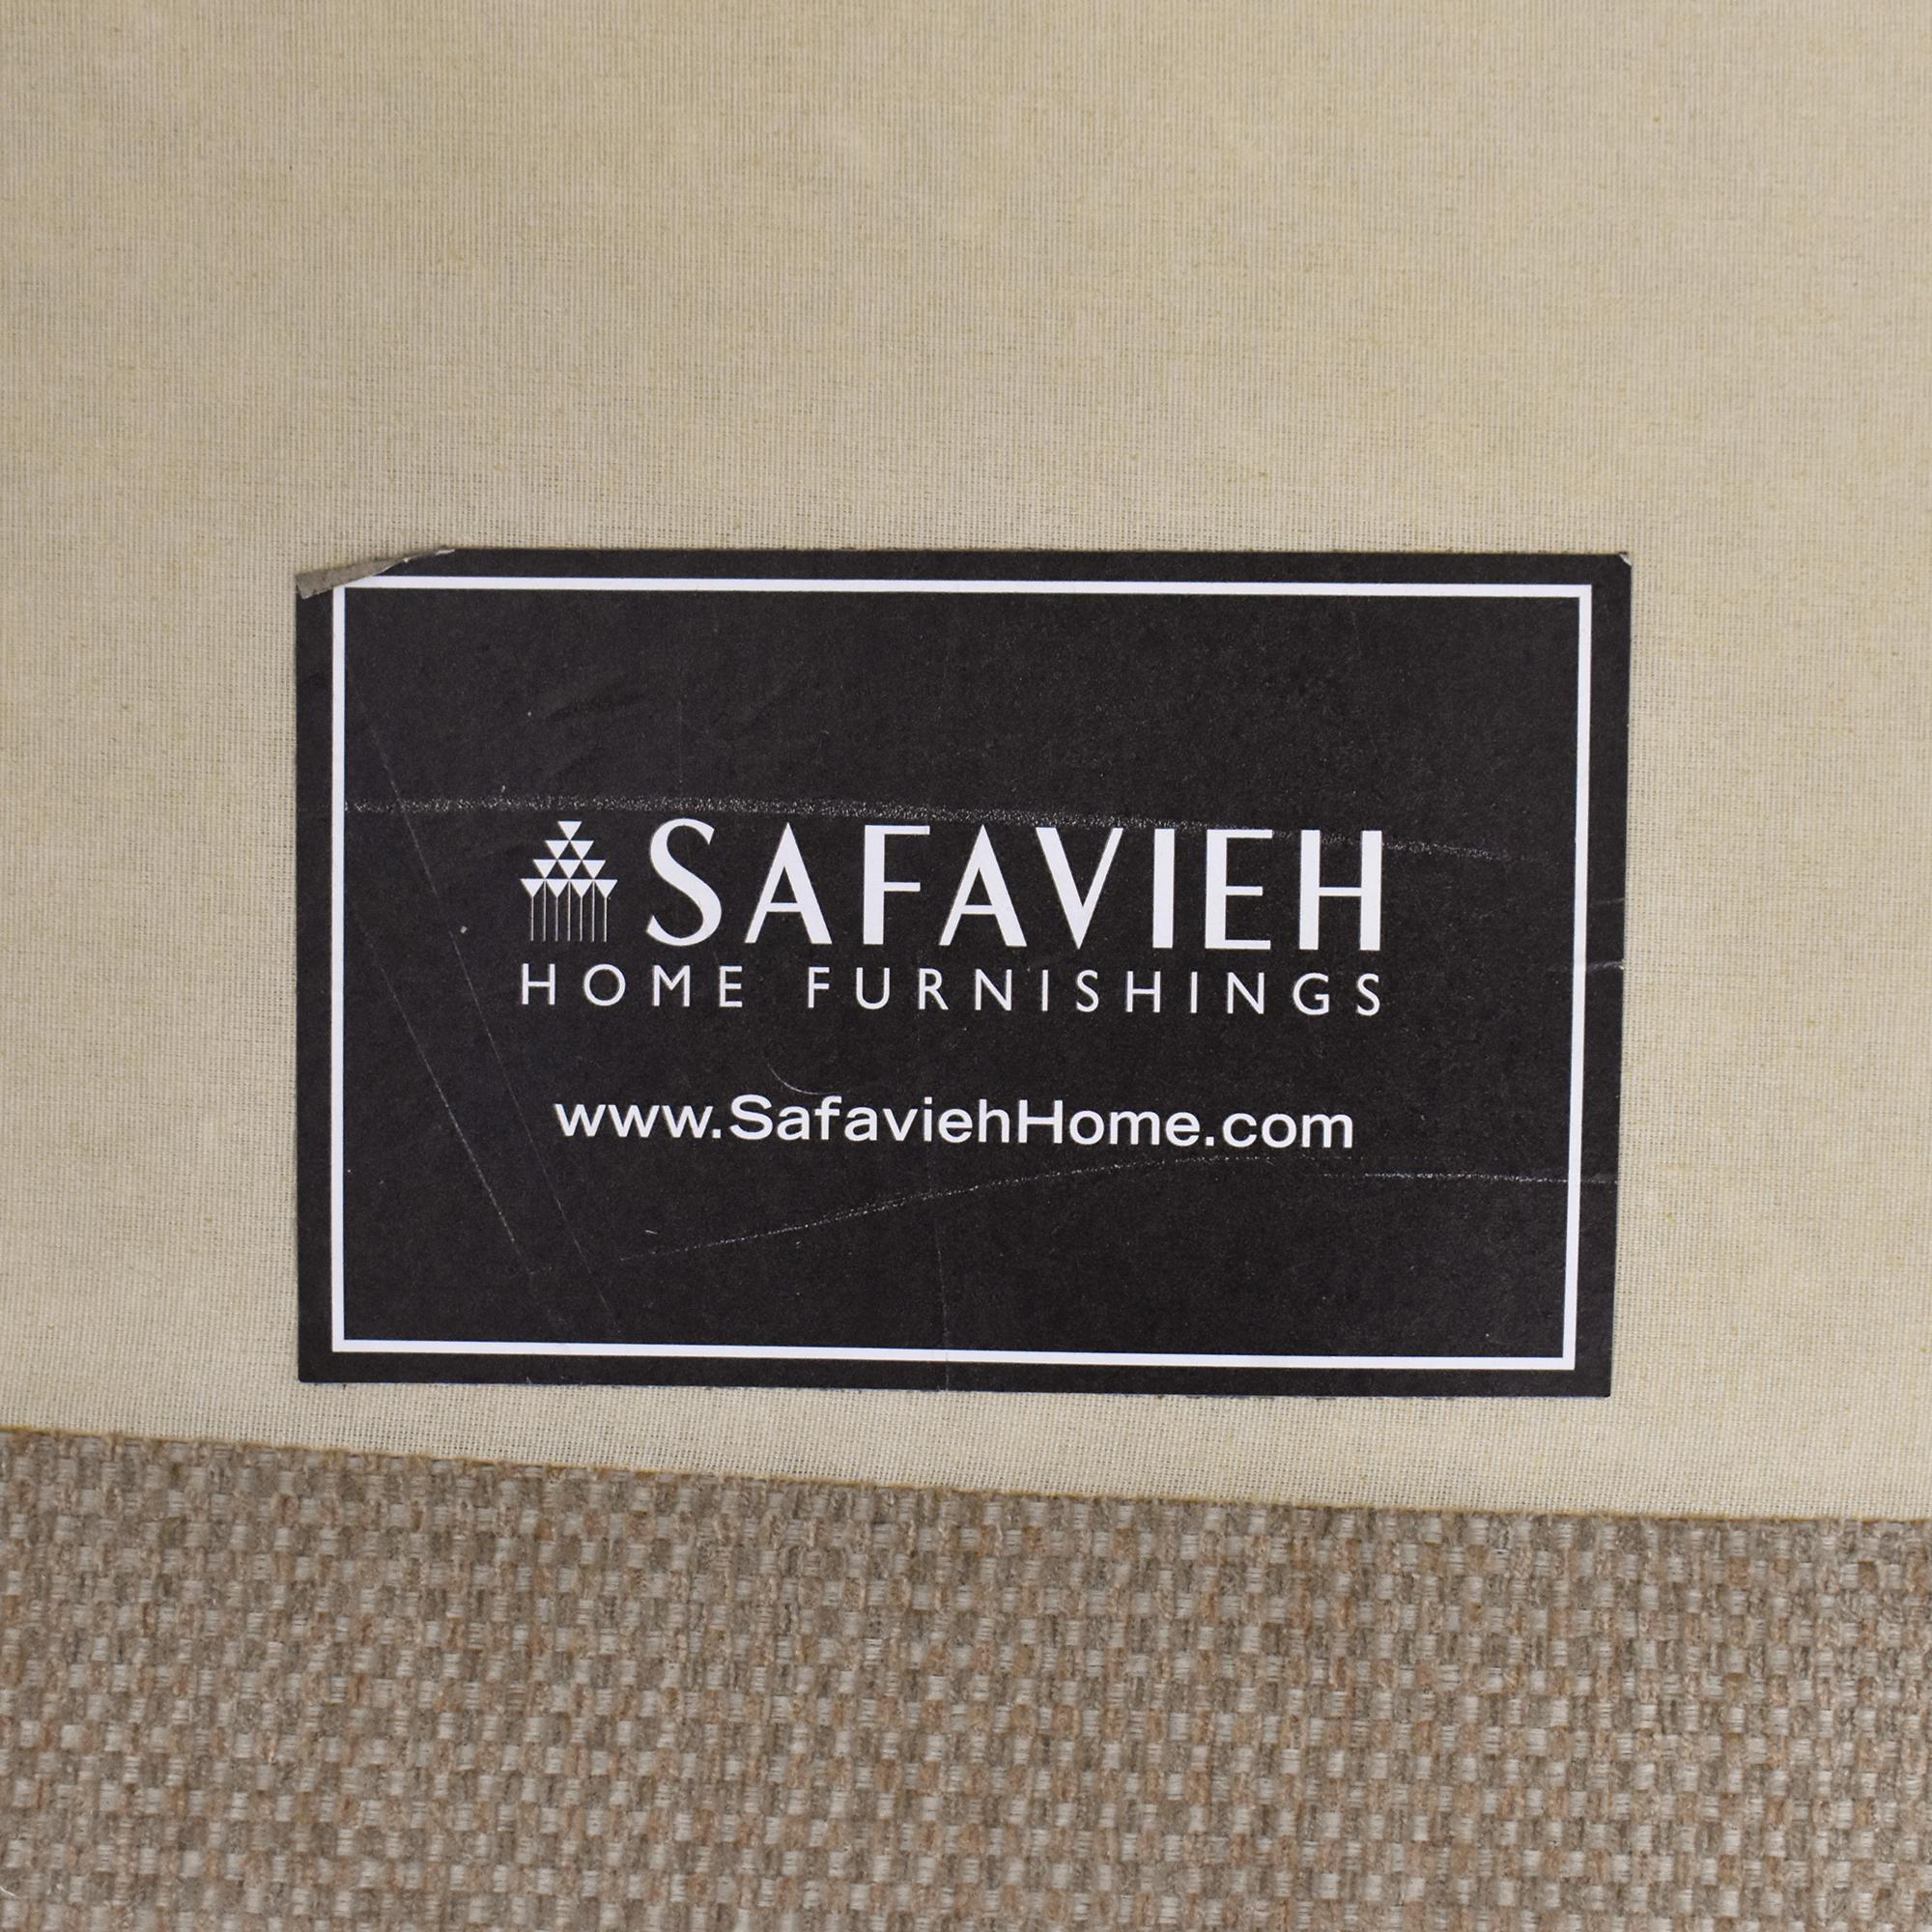 Safavieh Safavieh Two Piece Sectional Sofa second hand